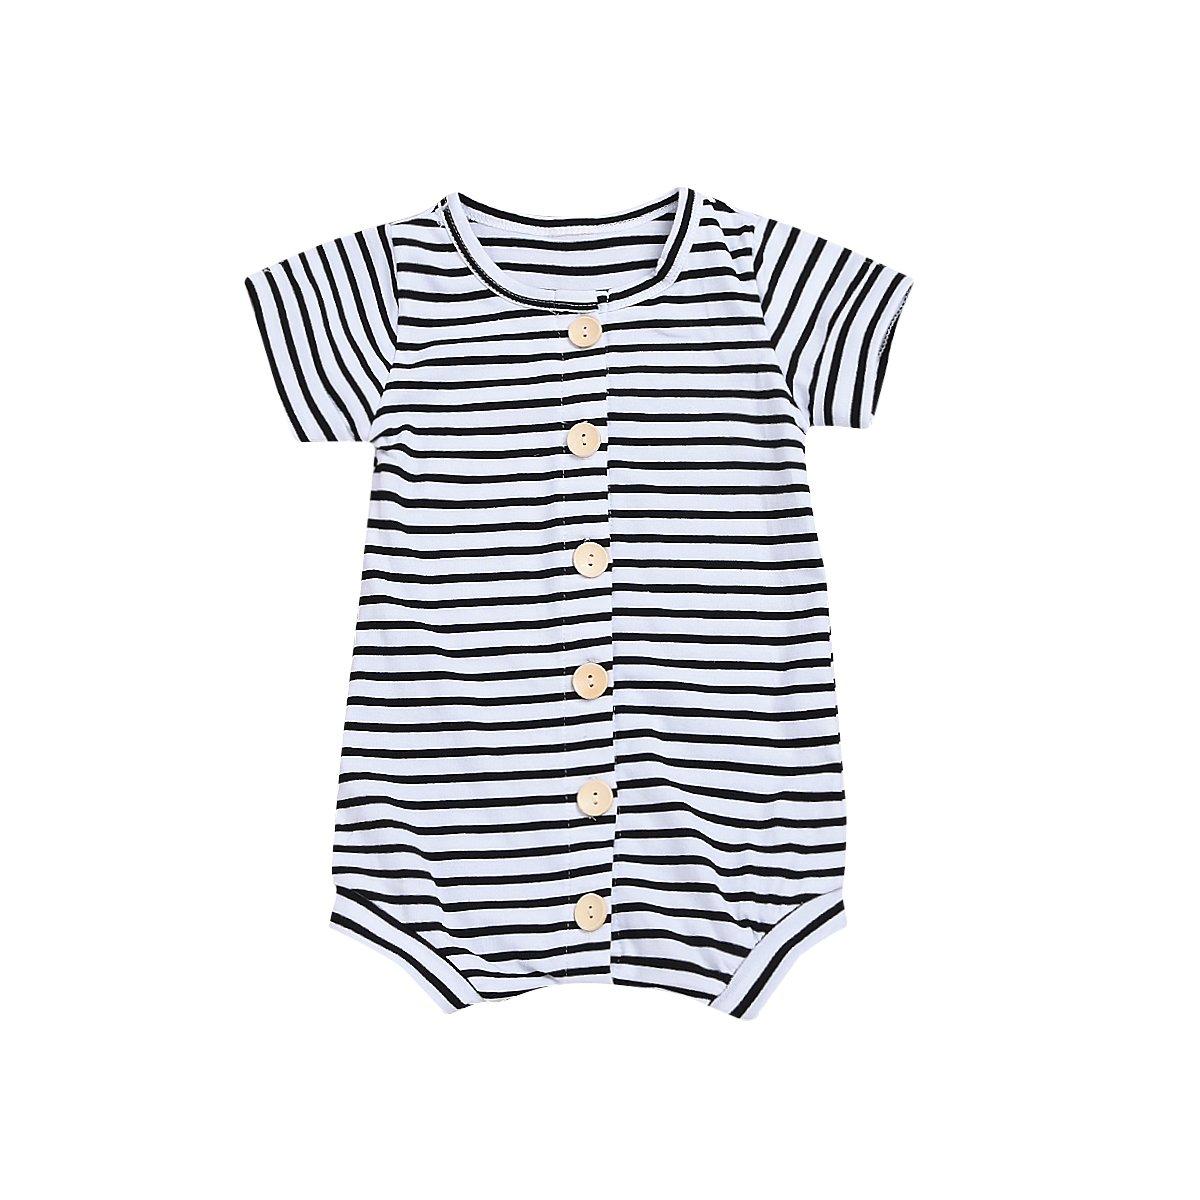 Younger Tree Infant Toddler Baby Boy Romper Summer Jumpsuit Short Sleeve Clothing Set (Stripe, 0-6 m)